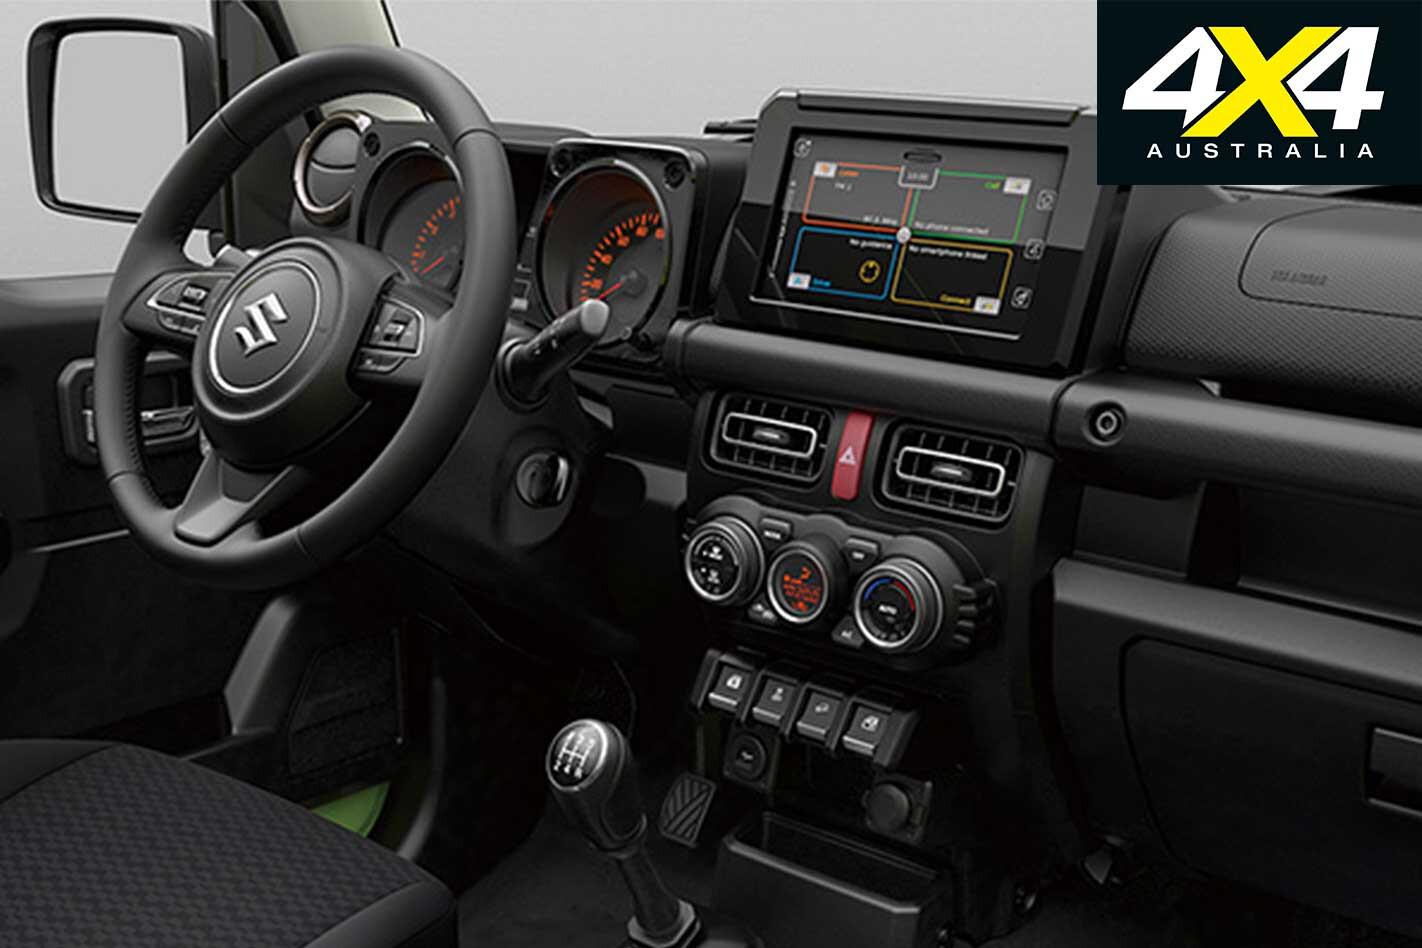 2019 Suzuki Jimny Interior Jpg